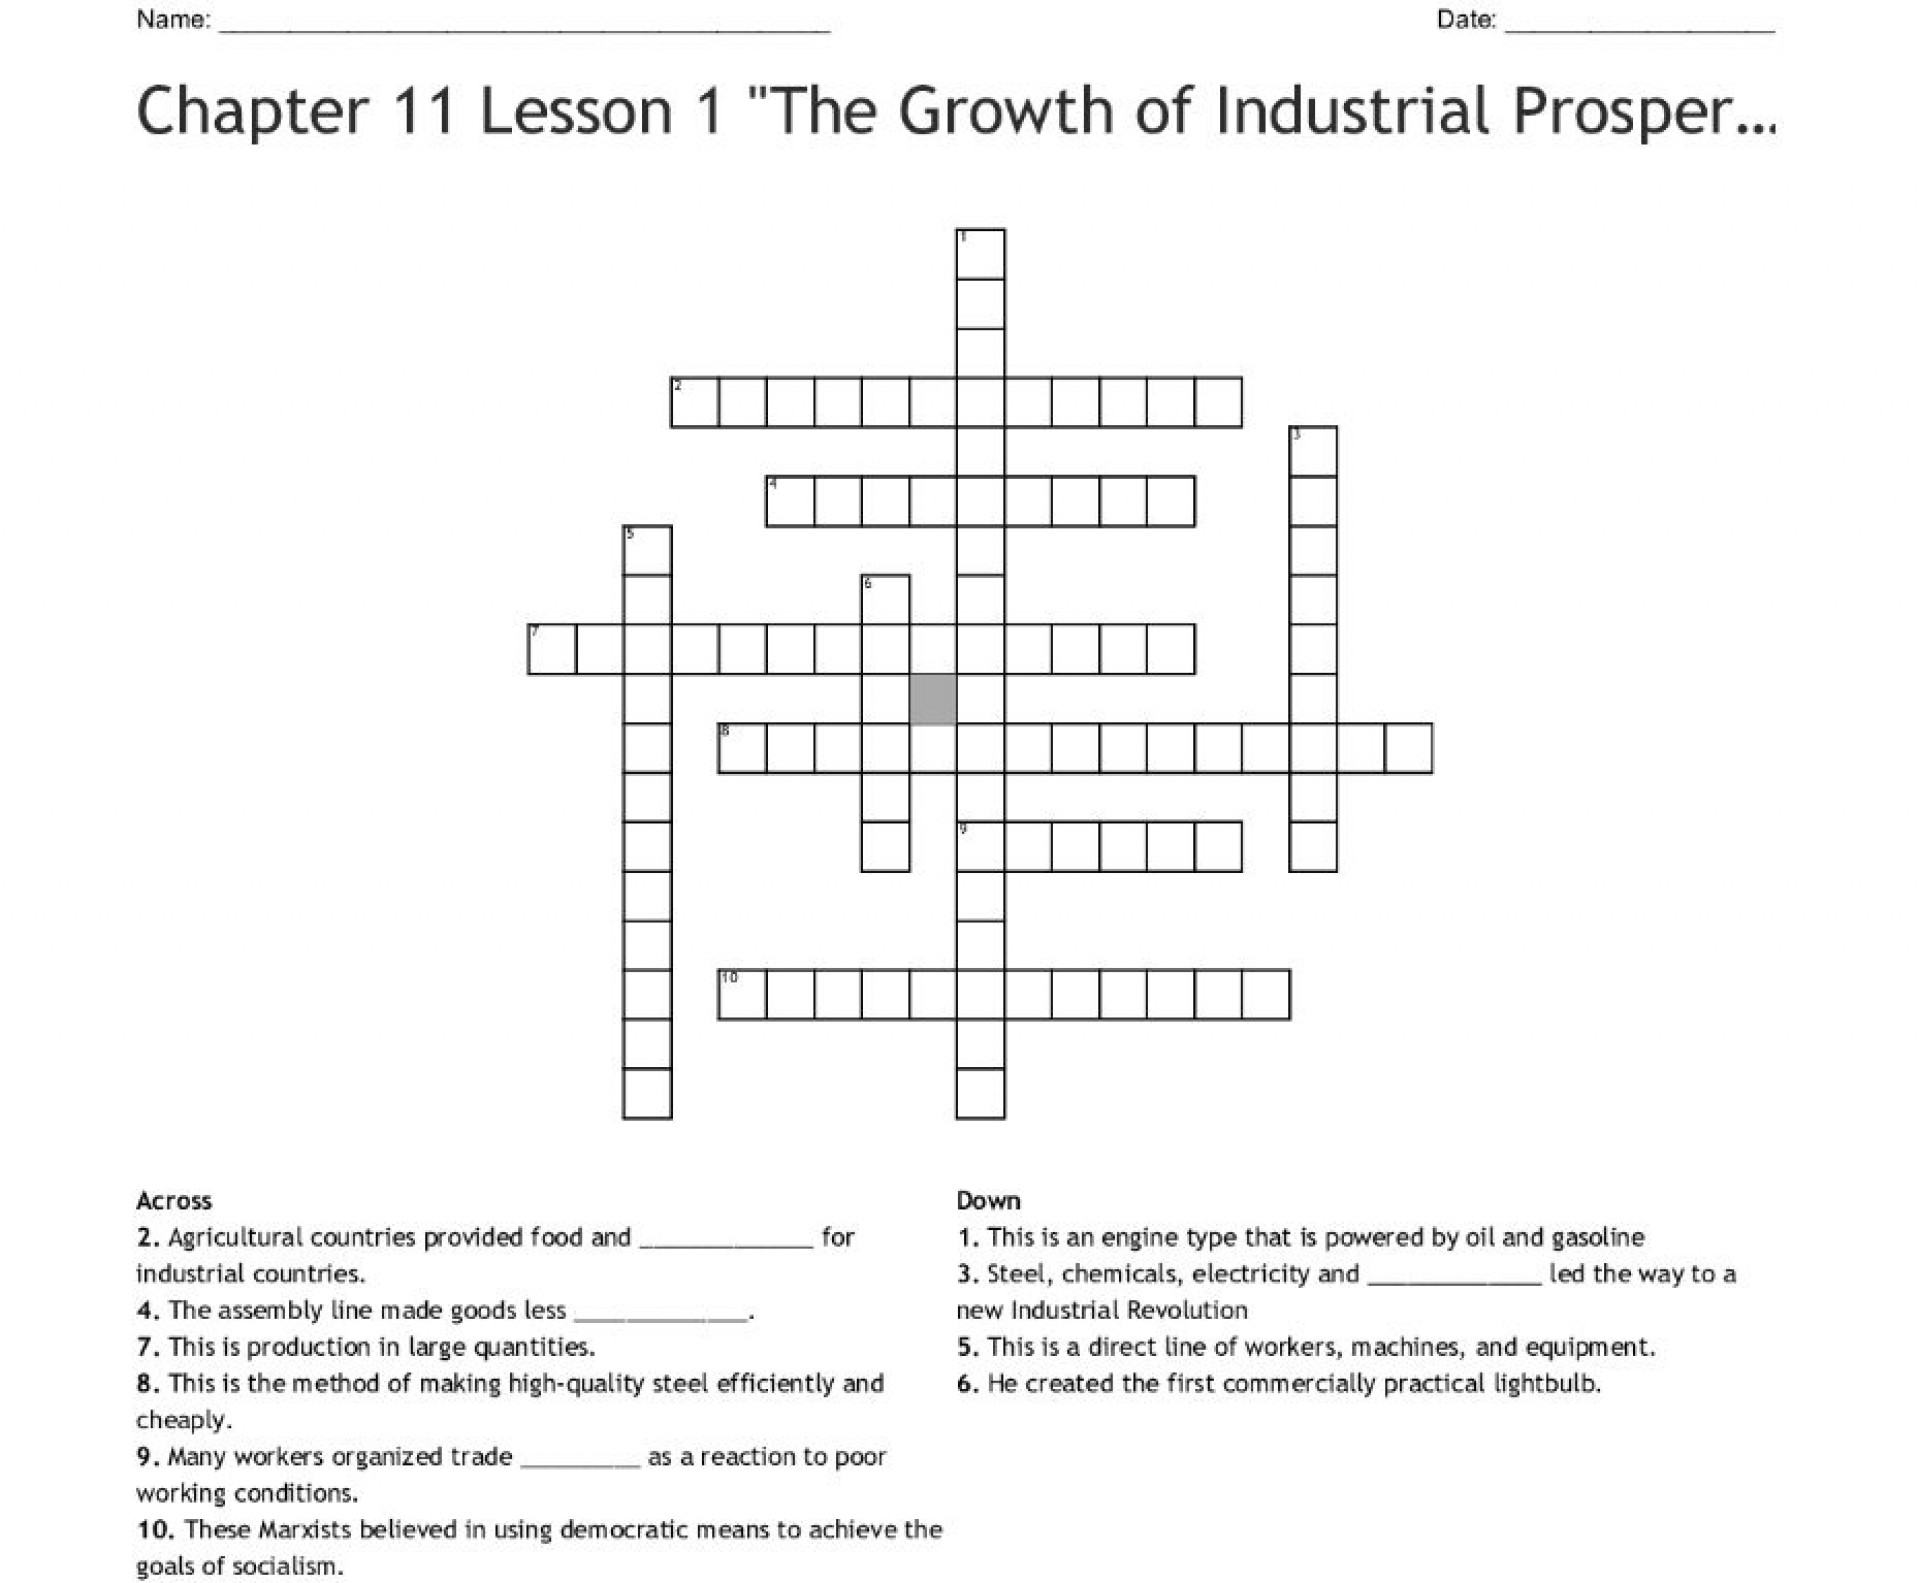 000 Unbelievable Prosperity Crossword Design  Hollow Sound Of Sudden Clue Material 7 Letter1920